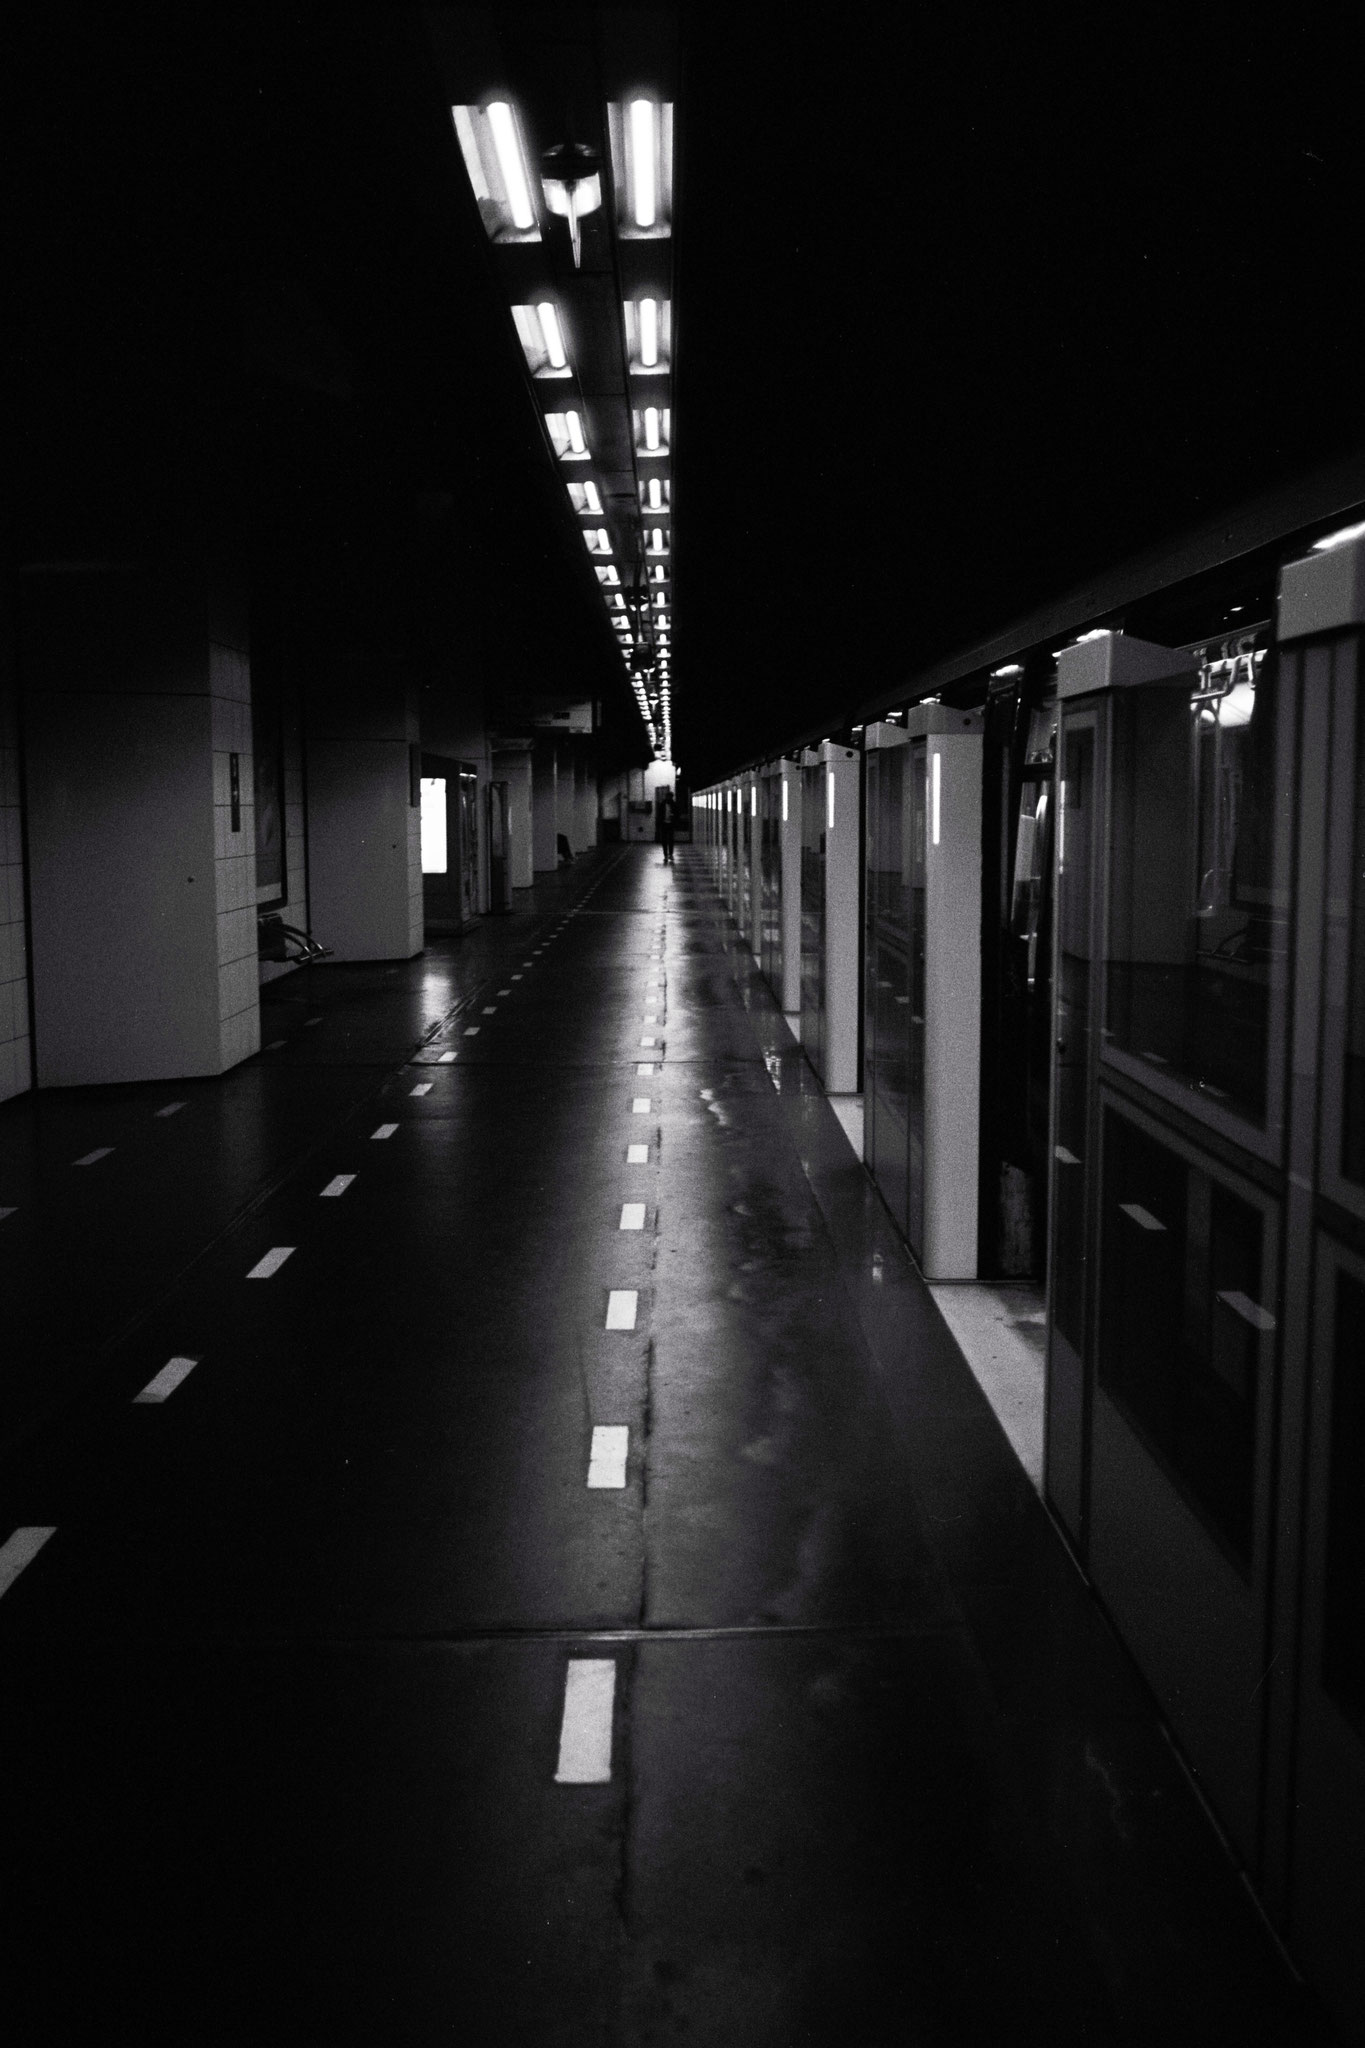 """On the road to Paris "" - Station La Défense (M°1), 2021. Rollei Blackbird Creative 64 ASA. © Clémence Rougetet"